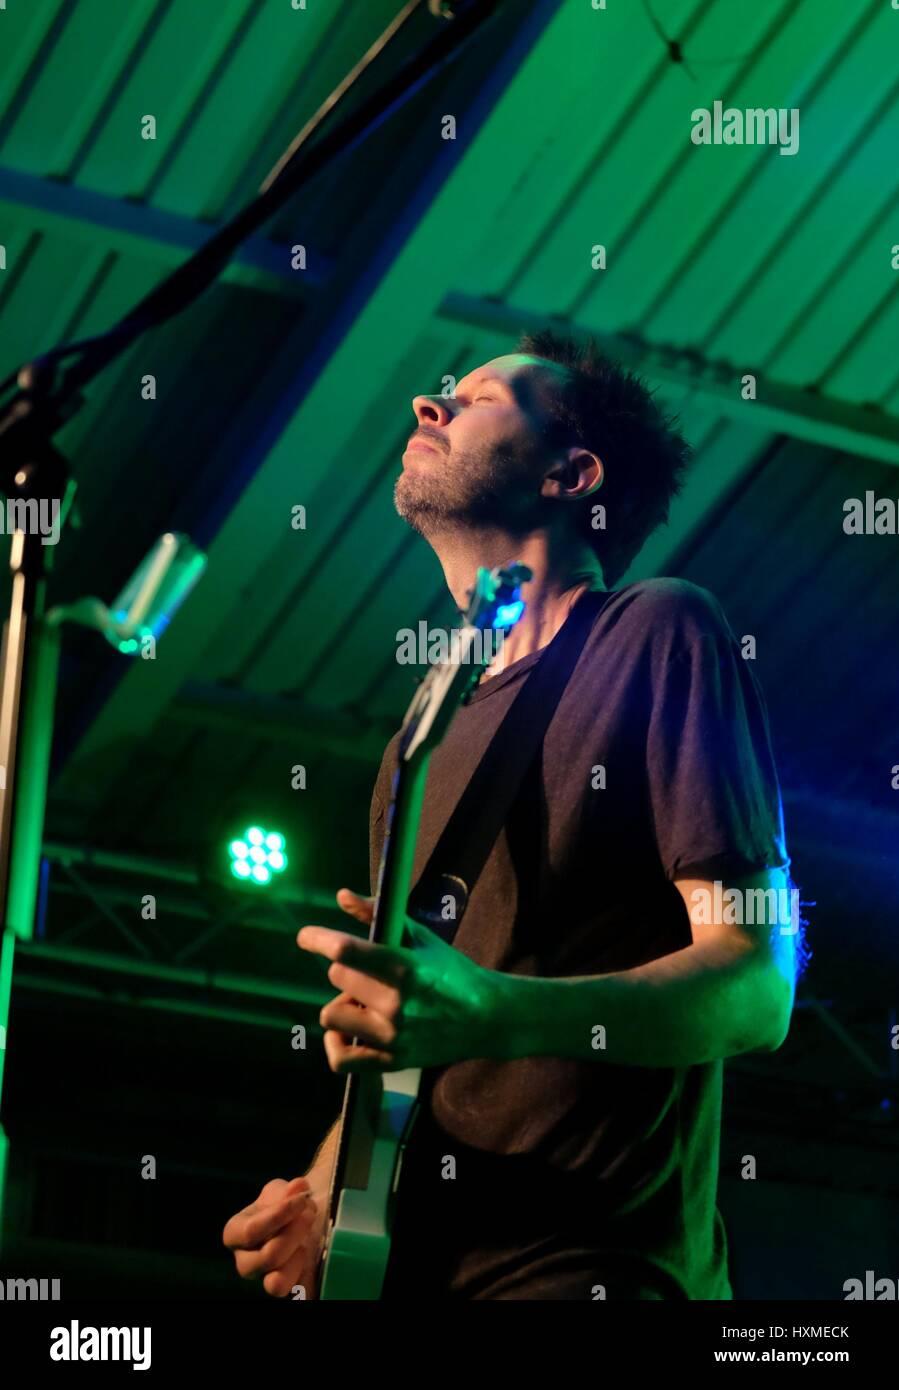 Engine Rooms, Hampshire, 5th November 2016,  UK. American progressive rock singer Paul Gilbert  performing live - Stock Image